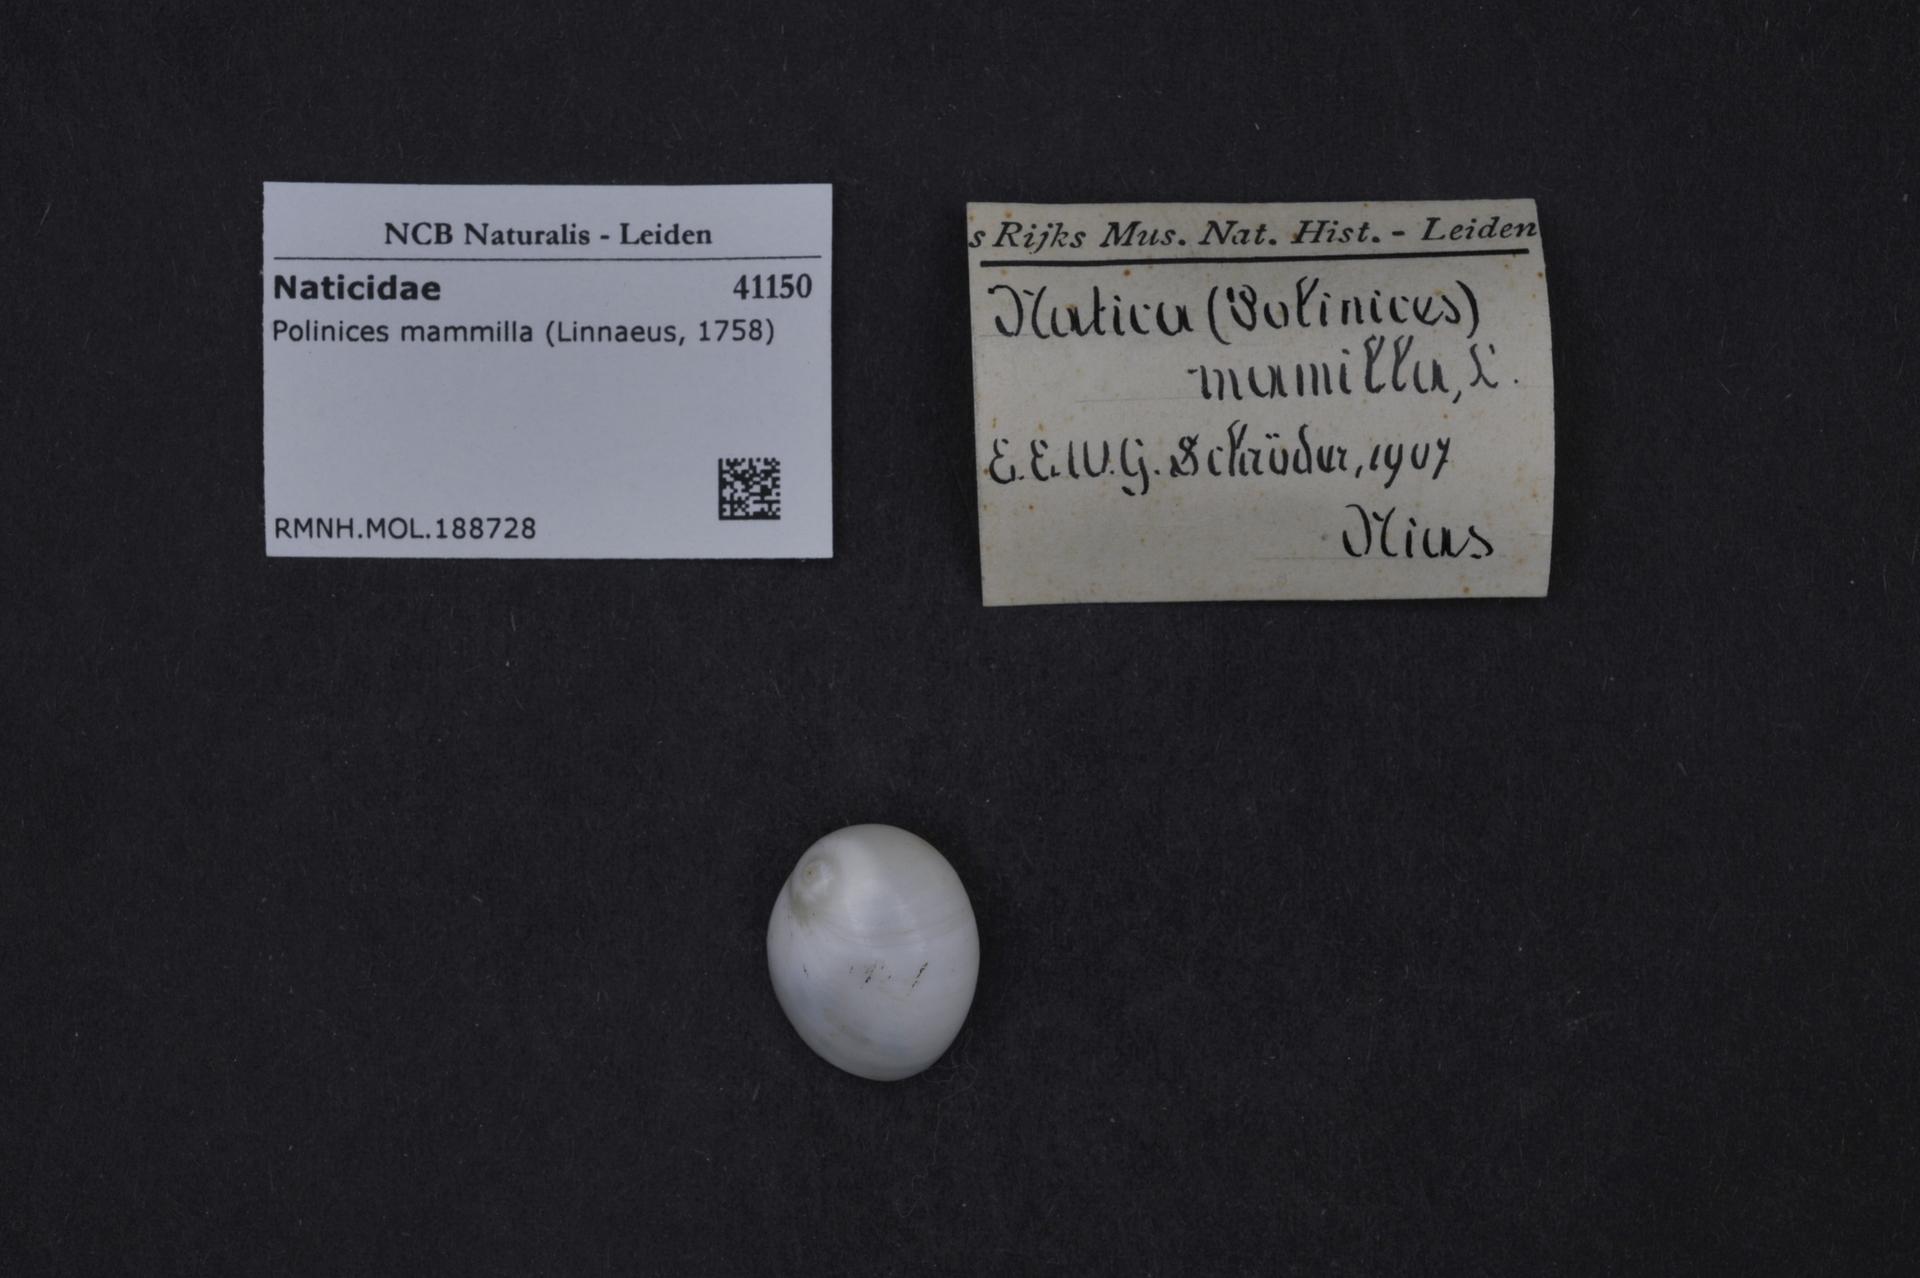 RMNH.MOL.188728 | Polinices mammilla (Linnaeus, 1758)